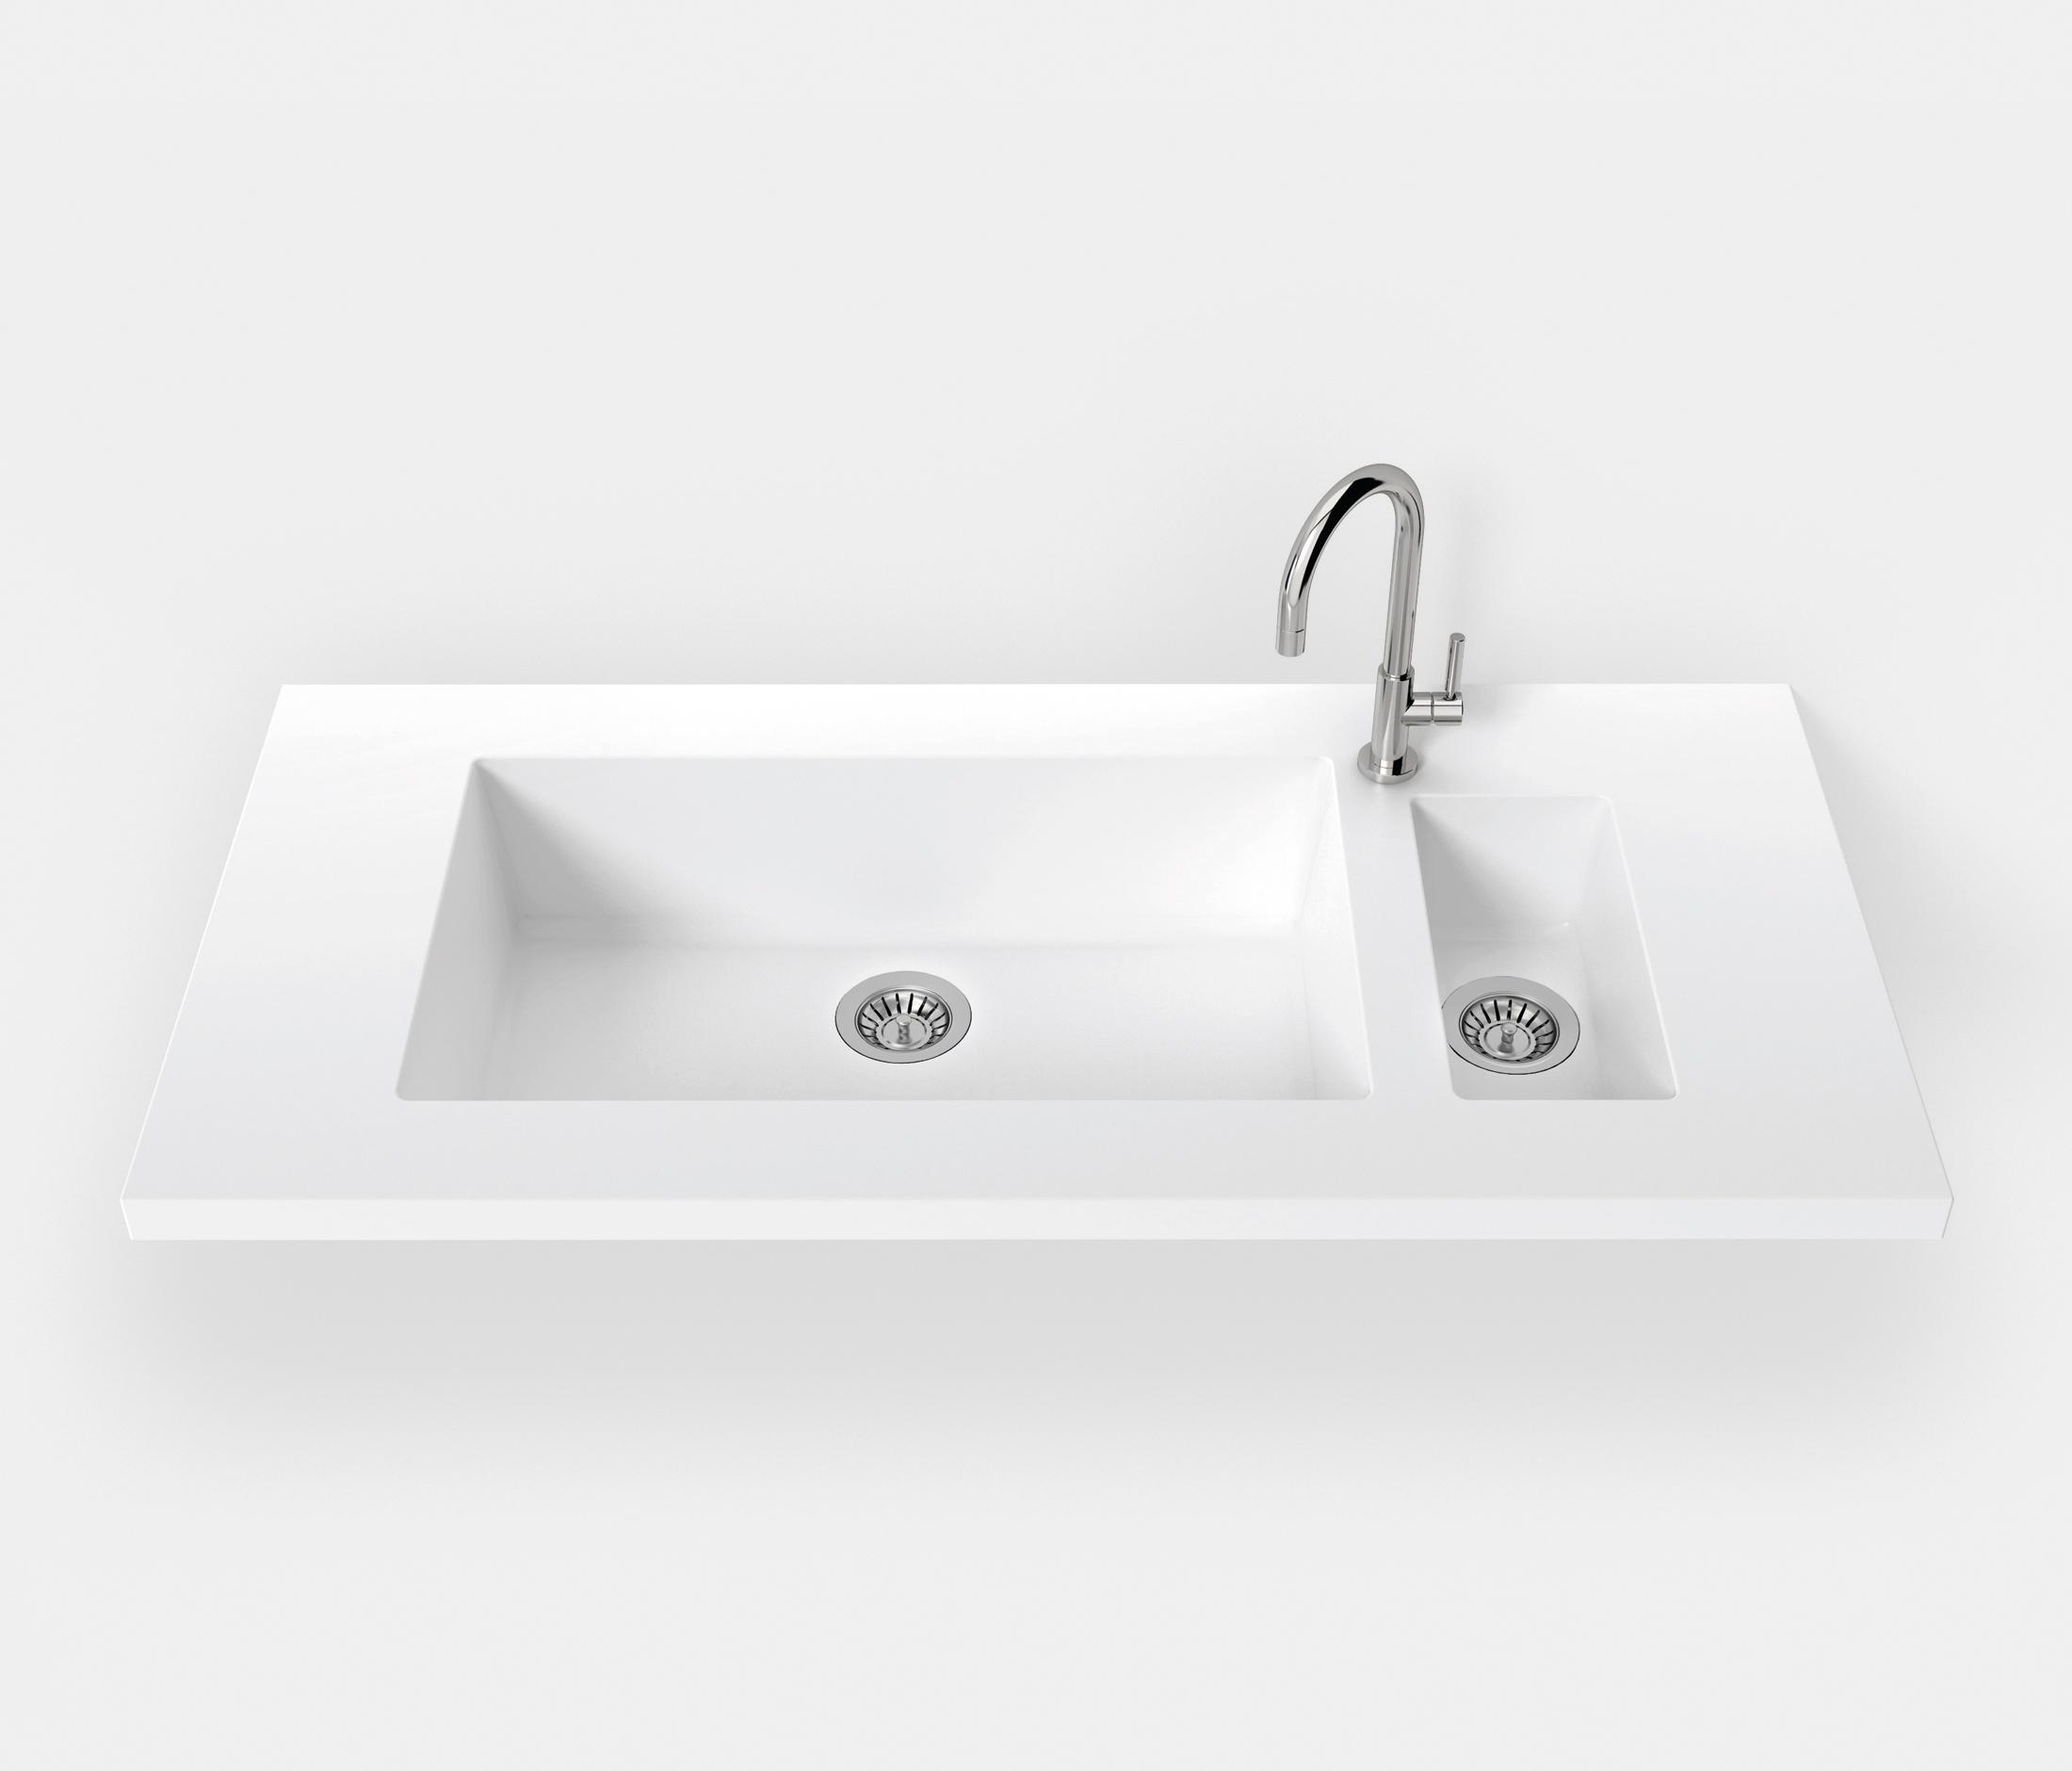 Bathroom Sink Dreamy-person: Best Of Corian Bathroom Sinks